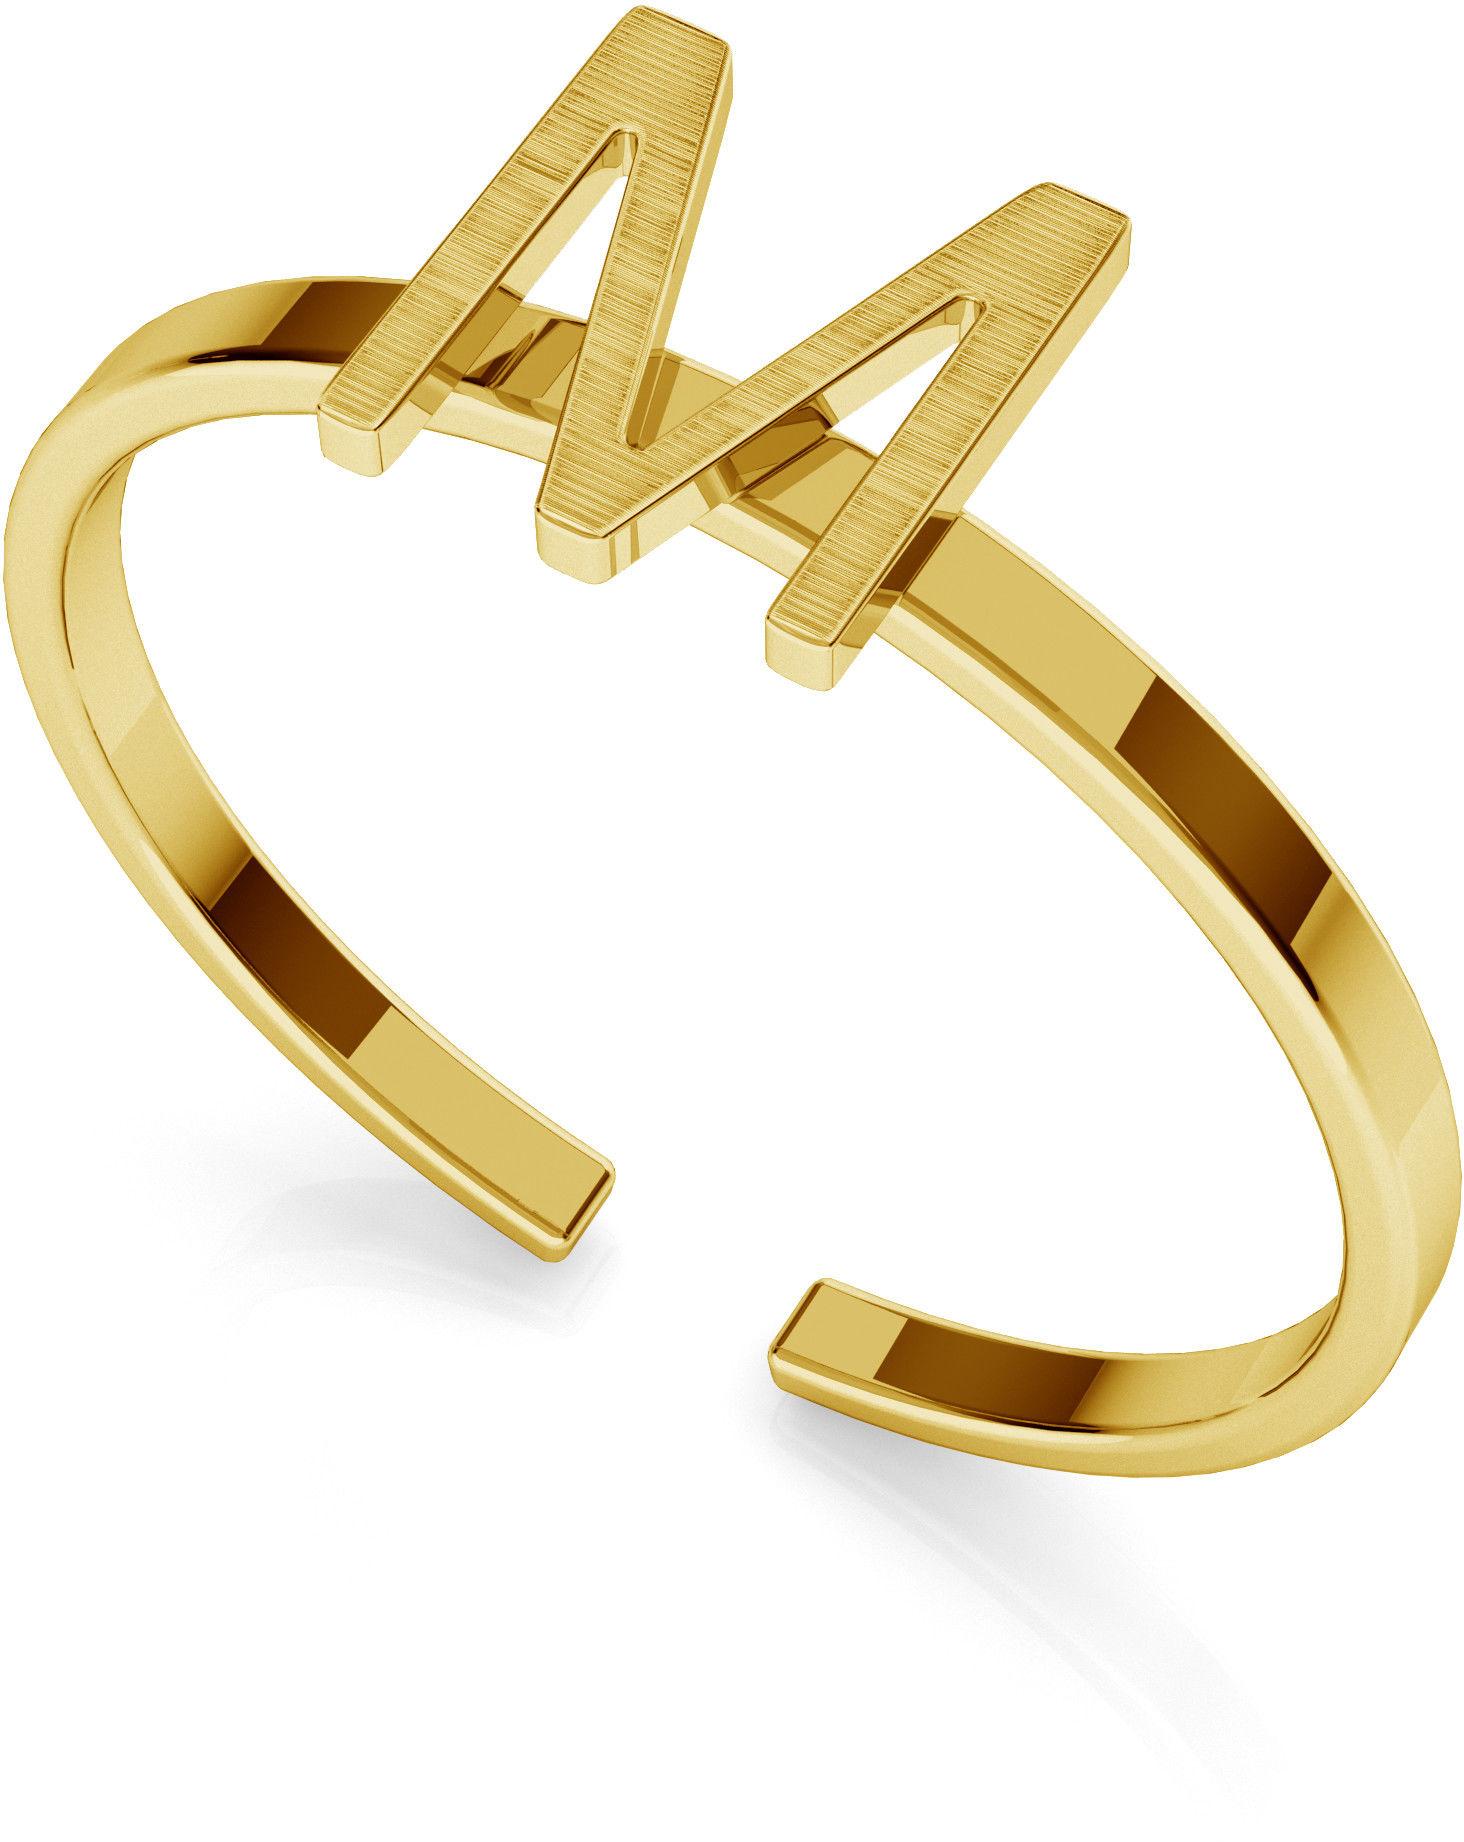 Srebrny pierścionek z literką My RING, srebro 925 : Litera - K, Srebro - kolor pokrycia - Pokrycie żółtym 18K złotem